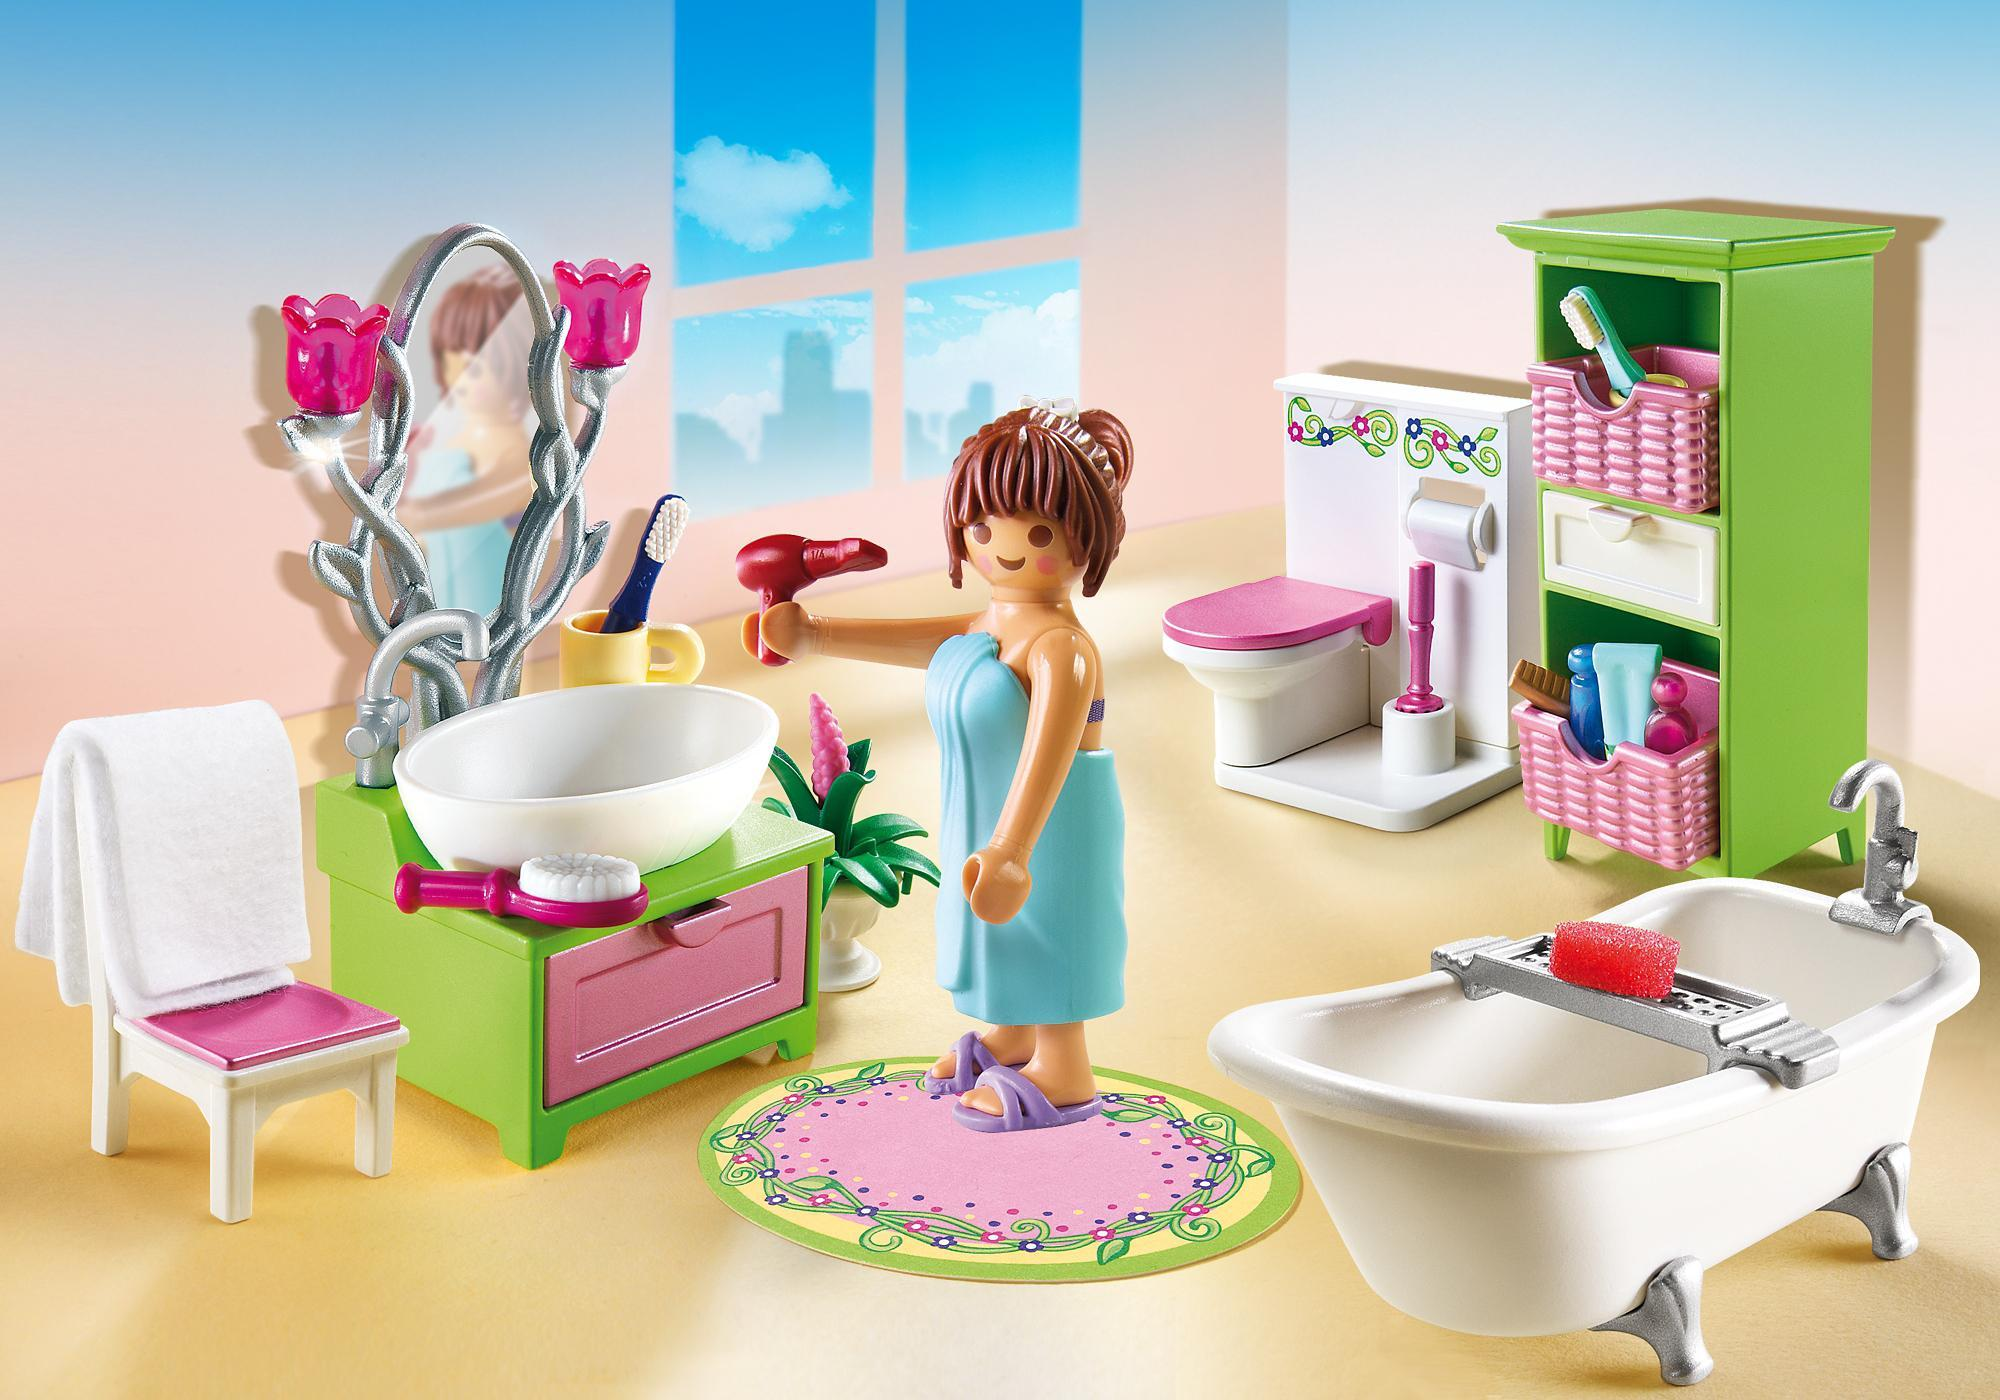 http://media.playmobil.com/i/playmobil/5307_product_detail/Salle de bains et baignoire